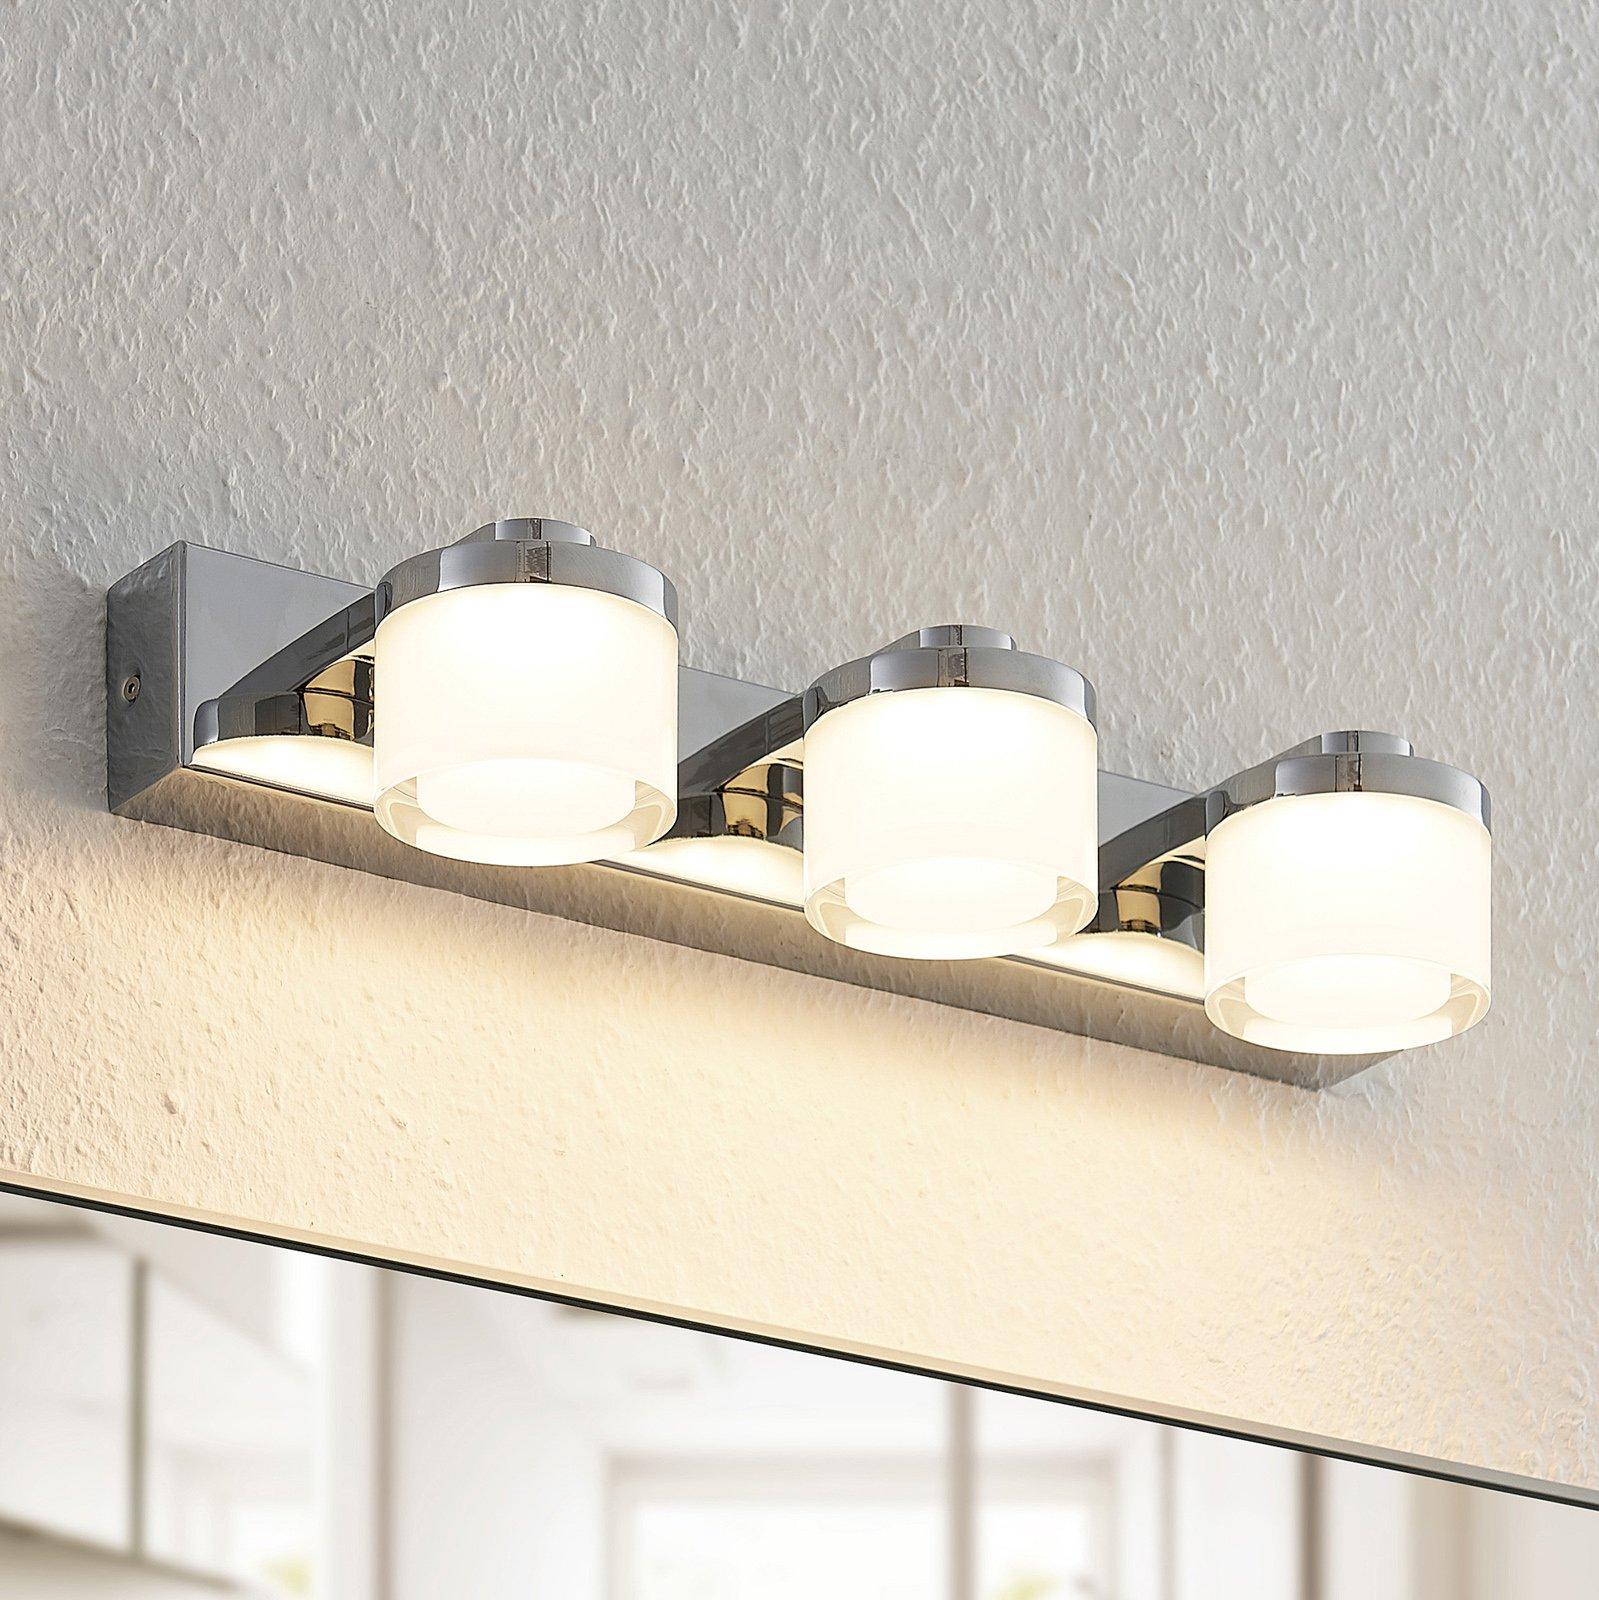 Arcchio Kejan LED-vegglampe, IP44, 3 lyskilder